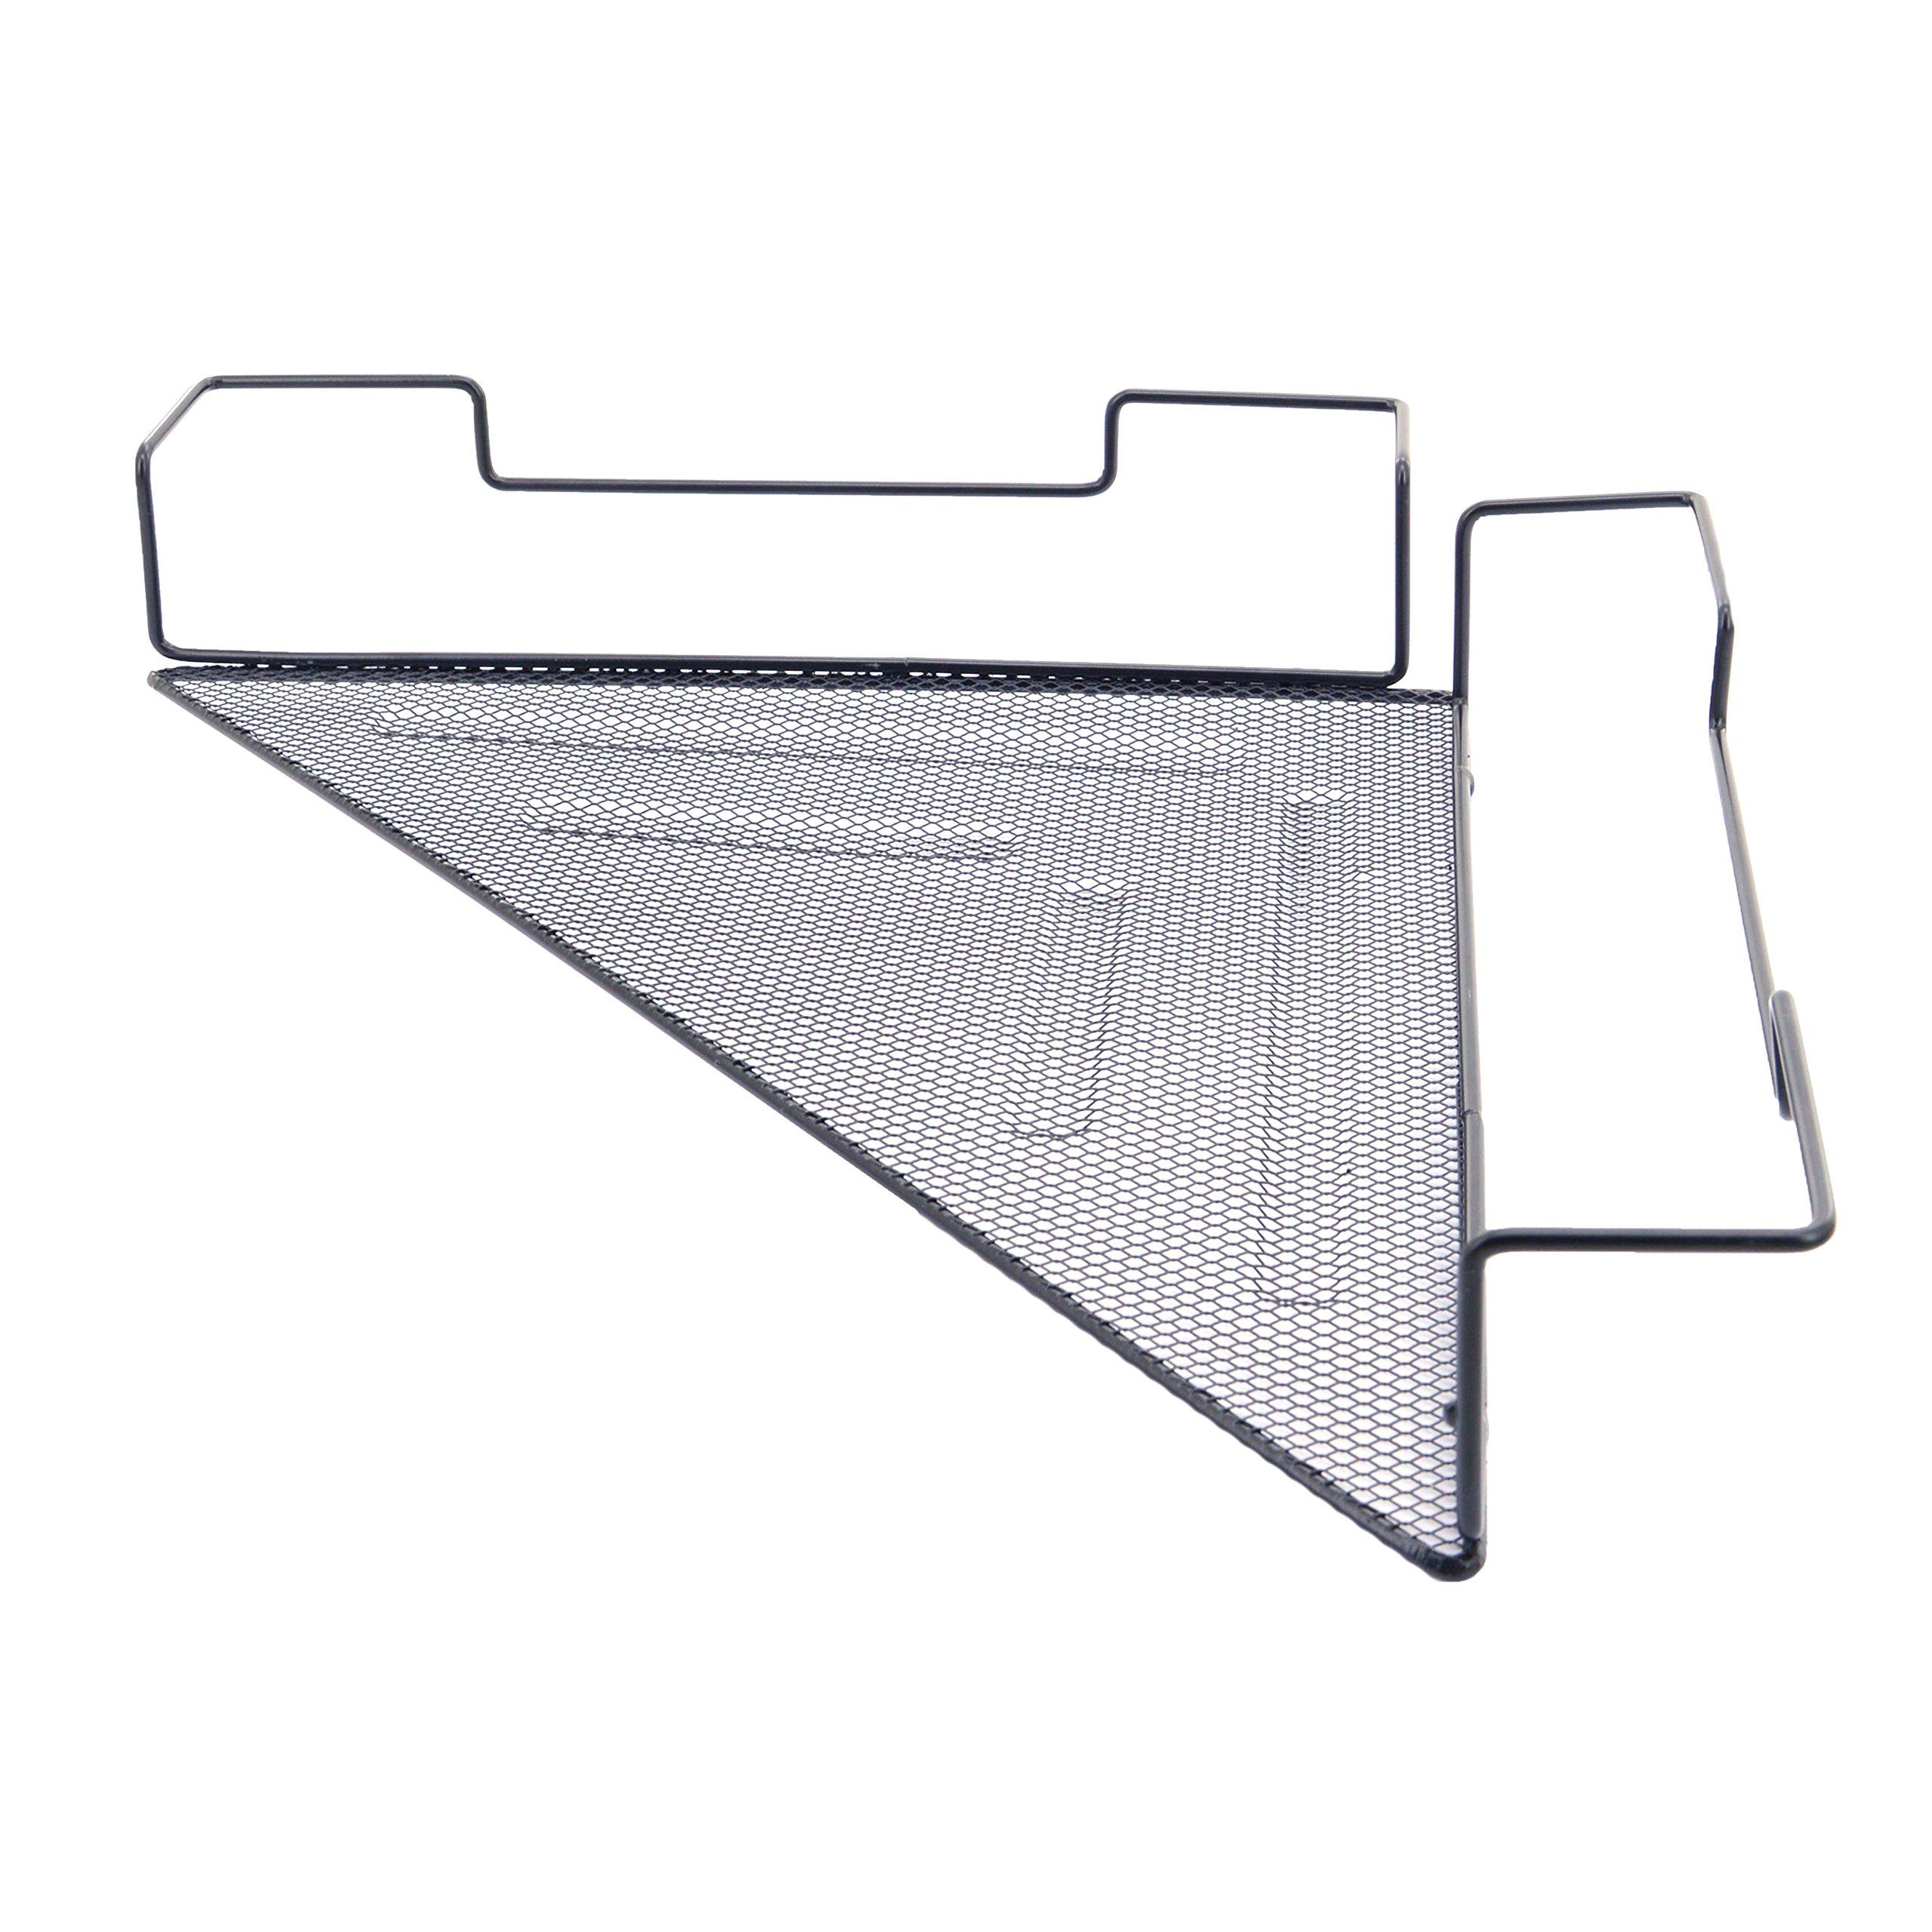 OKOMATCH Office Cubicle Corner Shelf Rack Desk Sundries Organizer / Balcony Corner Plant Caddy (Black,Iron Wire)